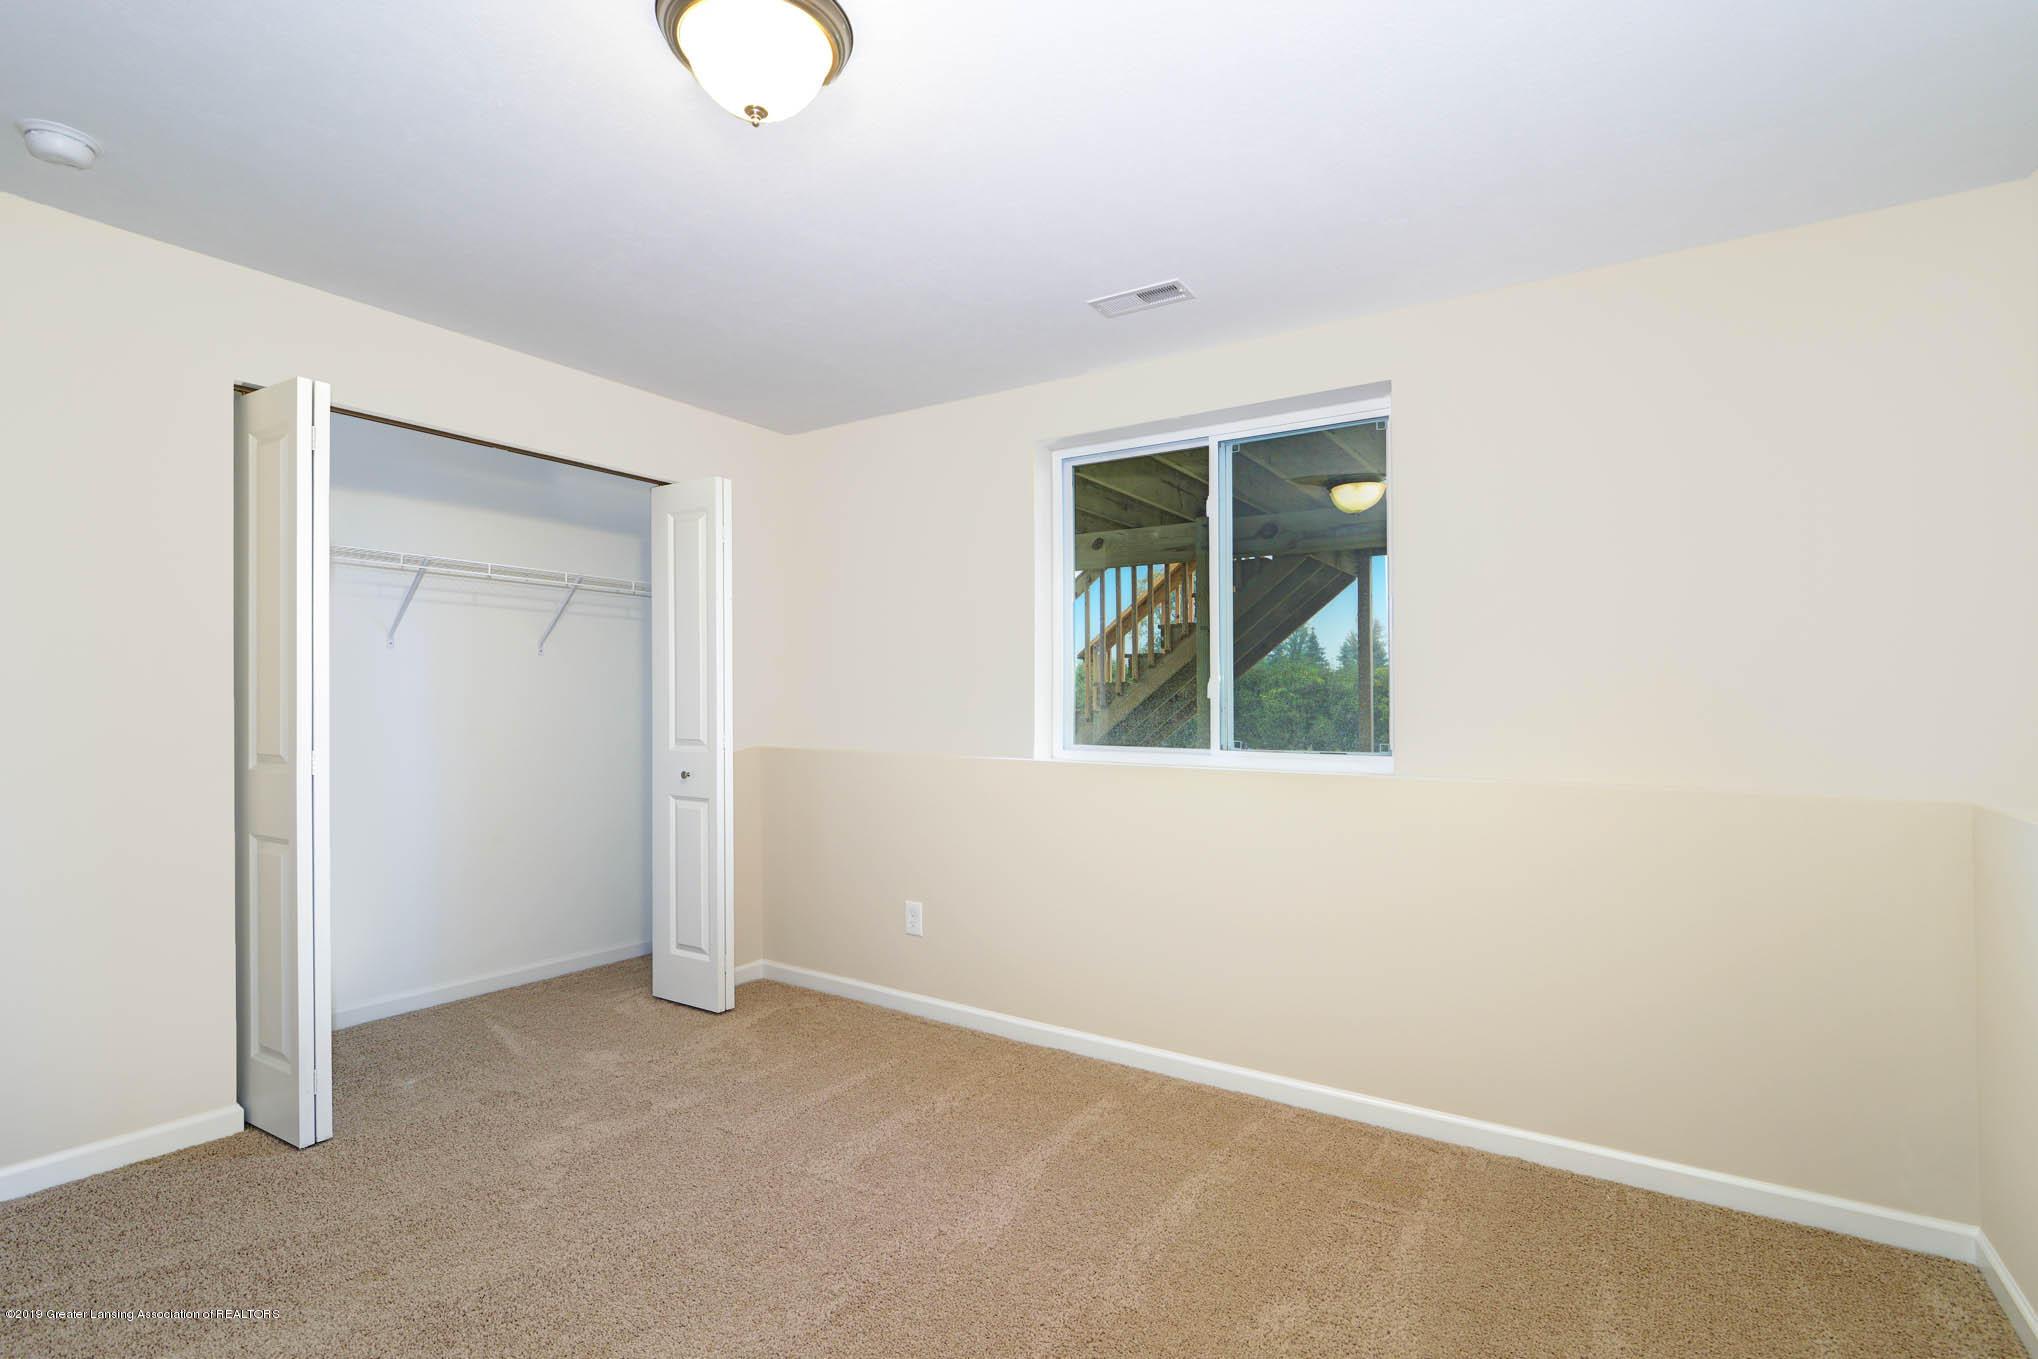 3532 Fernwood Ln - GDN069-C2040-Bed 2 - 10